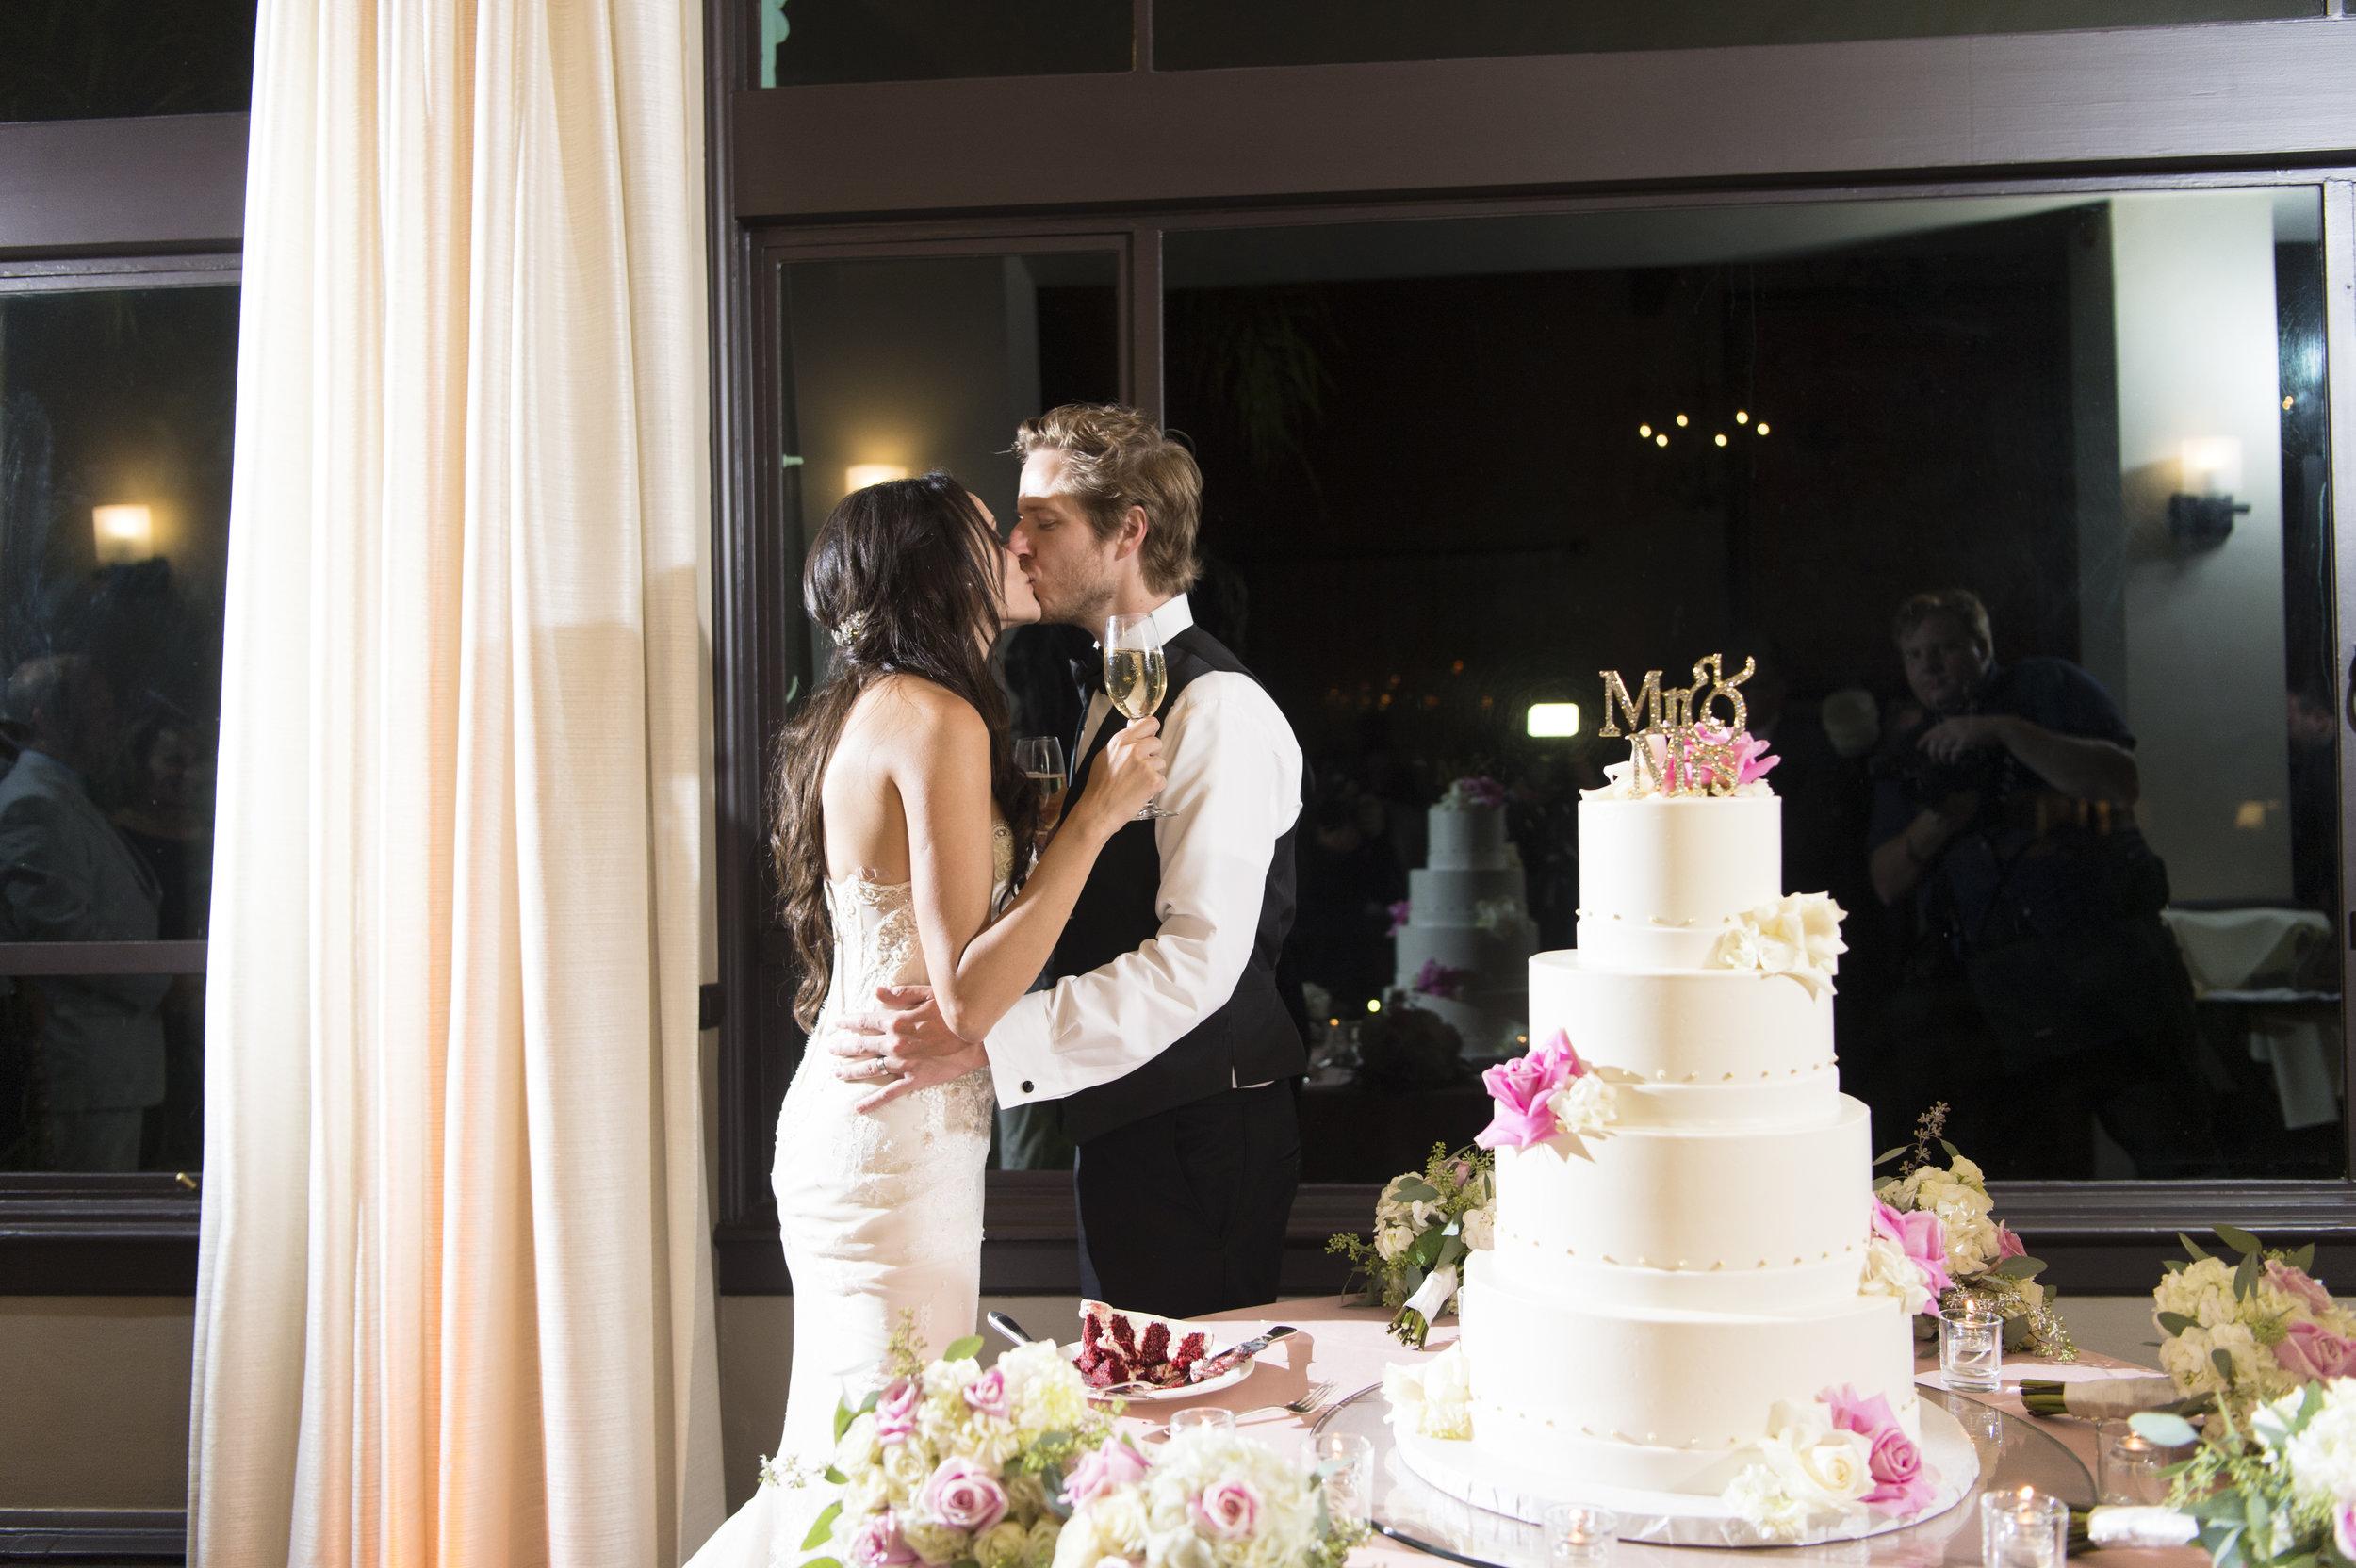 Wedding Cake Cutting - A Romantic Bel Air Bay Club Ocean-View Wedding - Southern California Wedding - Kevin Dinh Photography